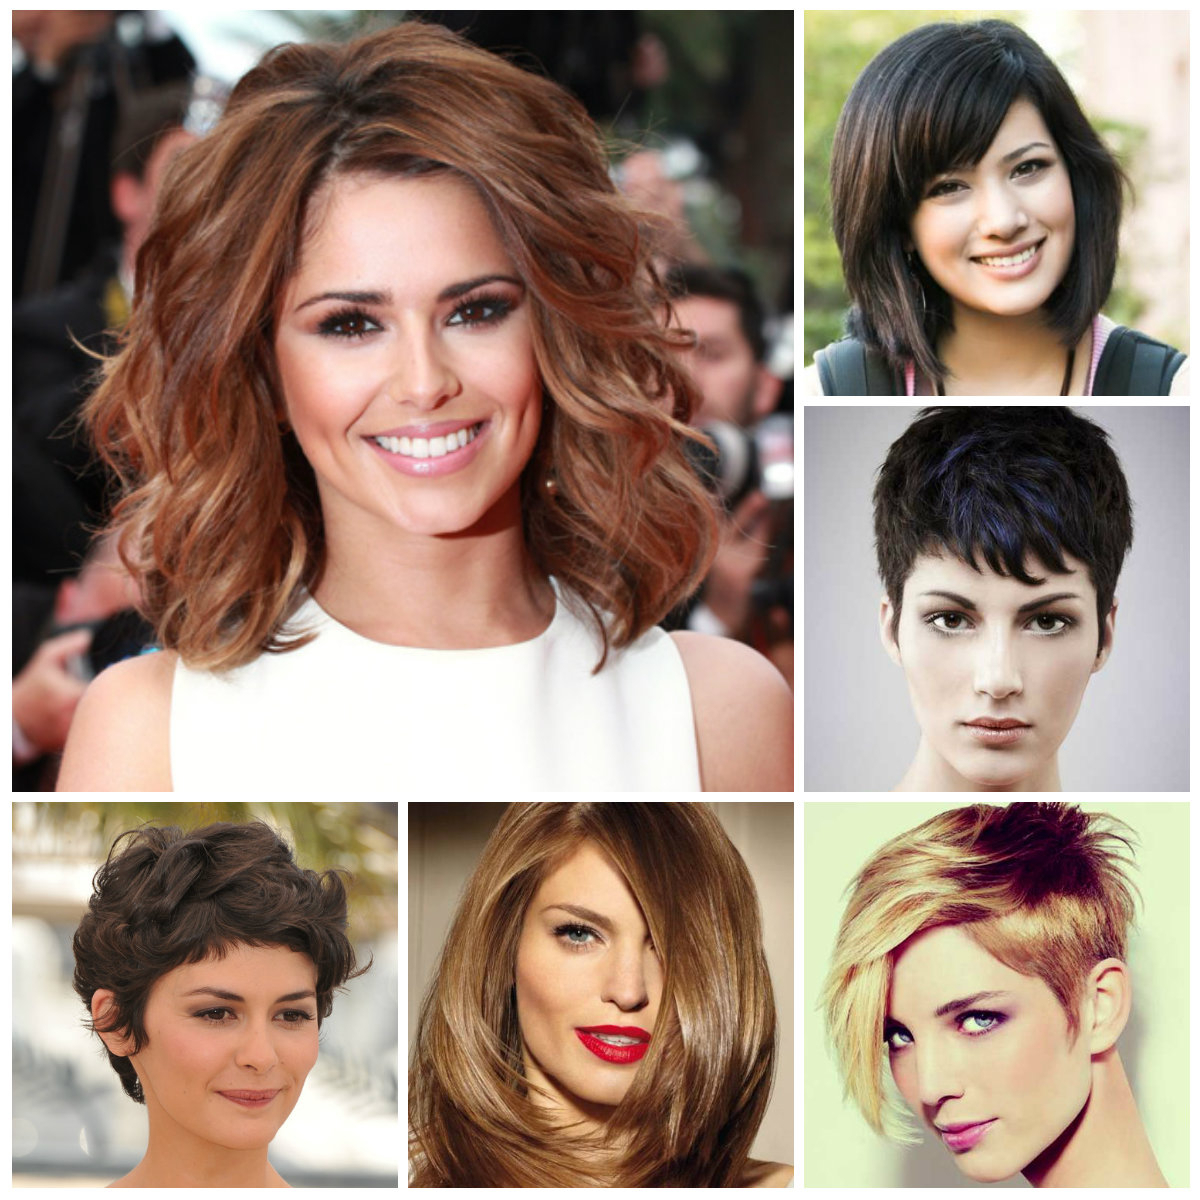 Medium And Short Haircuts For Thick Hair | Hairstyles For Women 2019 Inside Short Medium Haircuts For Thick Hair (View 23 of 25)